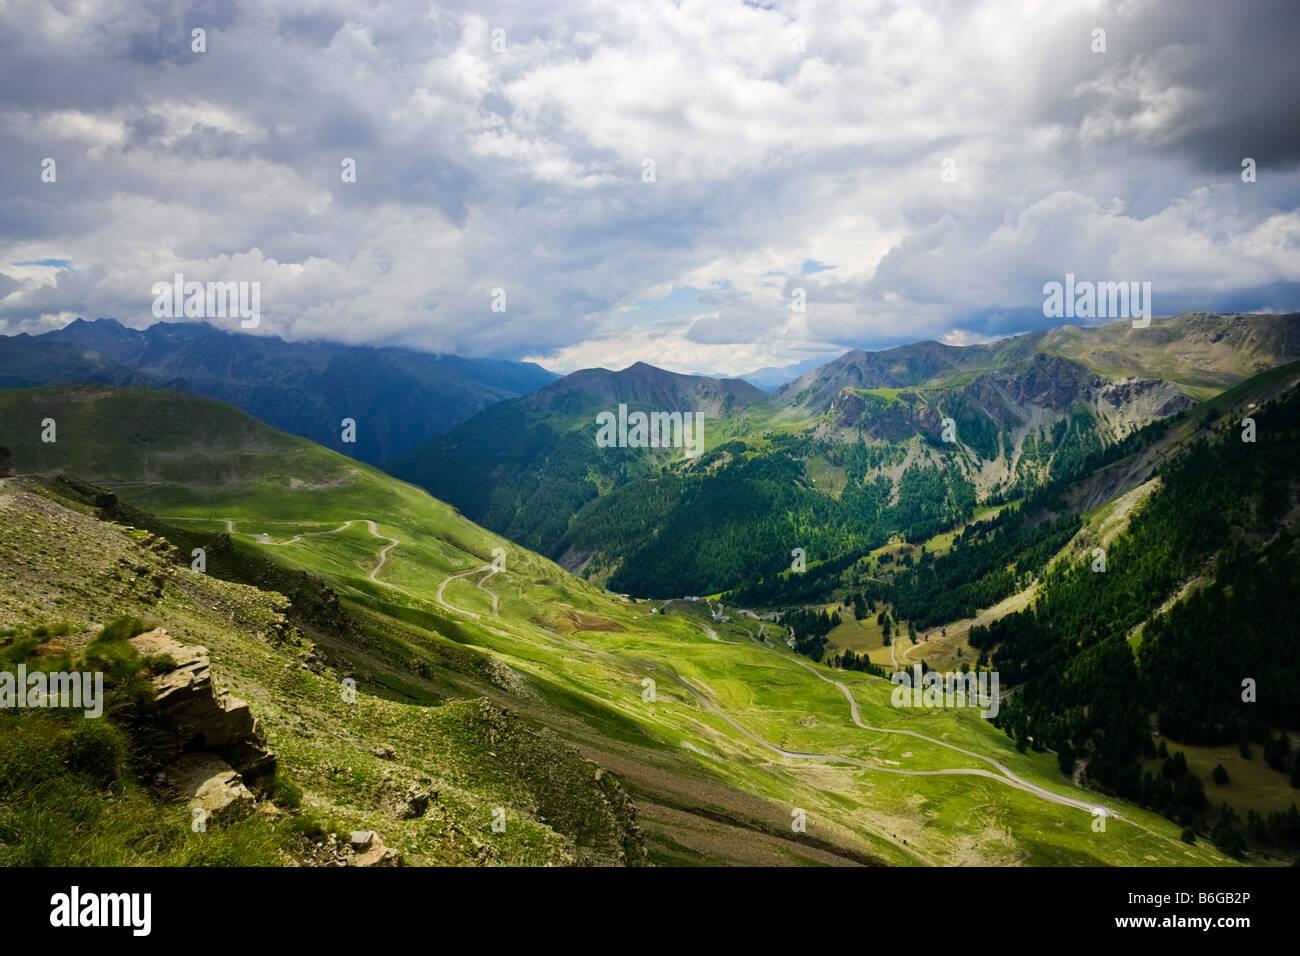 Vista desde la route de la Bonette en los Alpes Maritimes, tepezcuintle, Francia Imagen De Stock